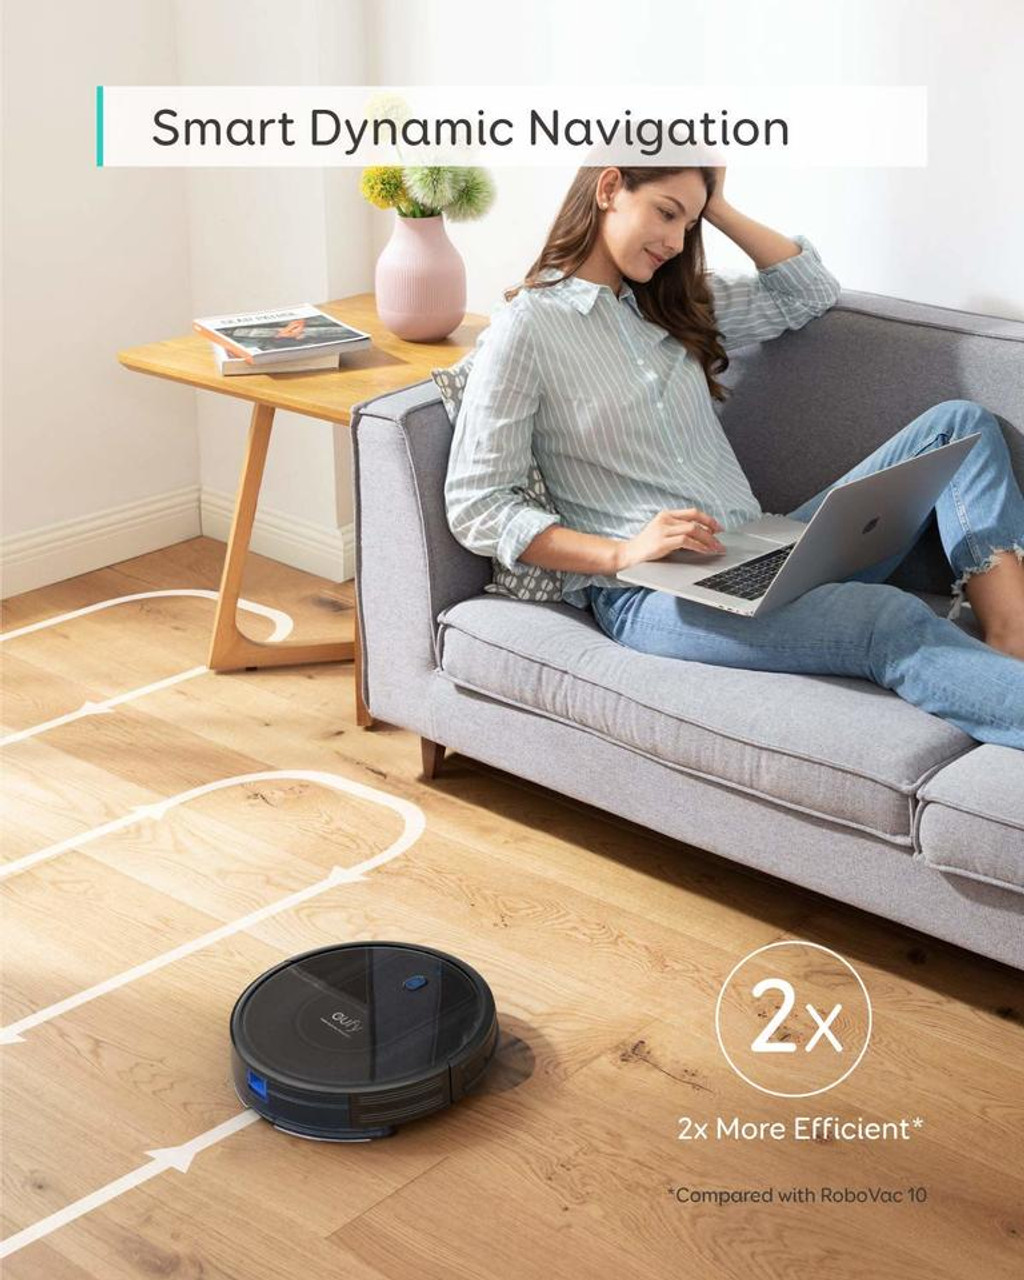 Eufy T215OT11 G10 Hybrid Smart Home RoboVac Vacuum and Mop